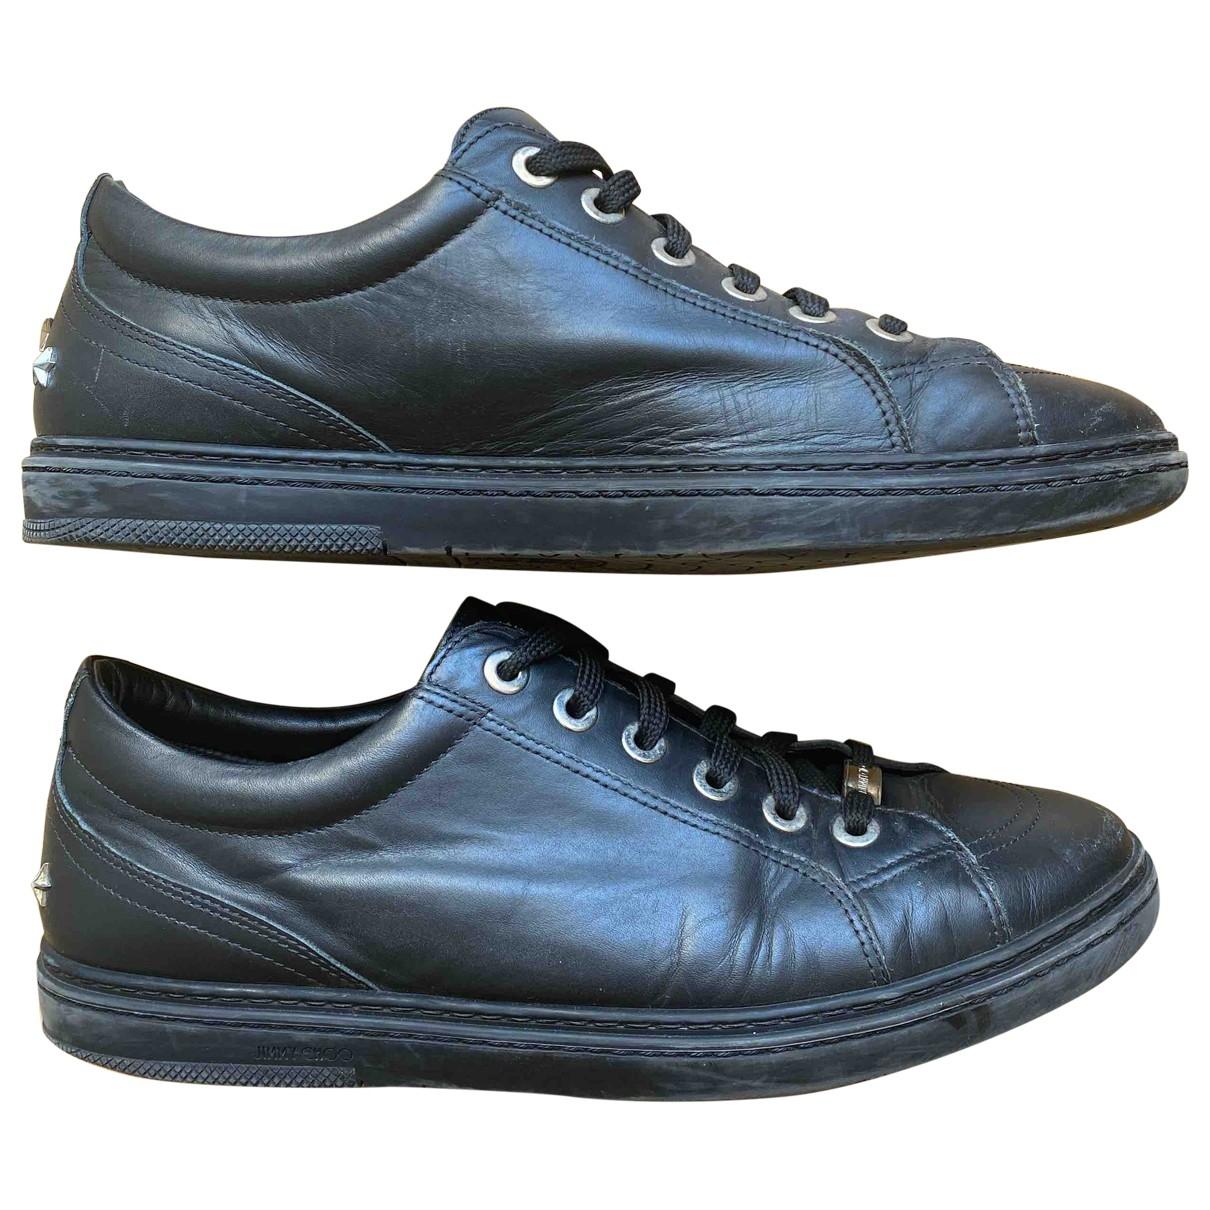 Jimmy Choo Cash Black Leather Trainers for Men 43 EU